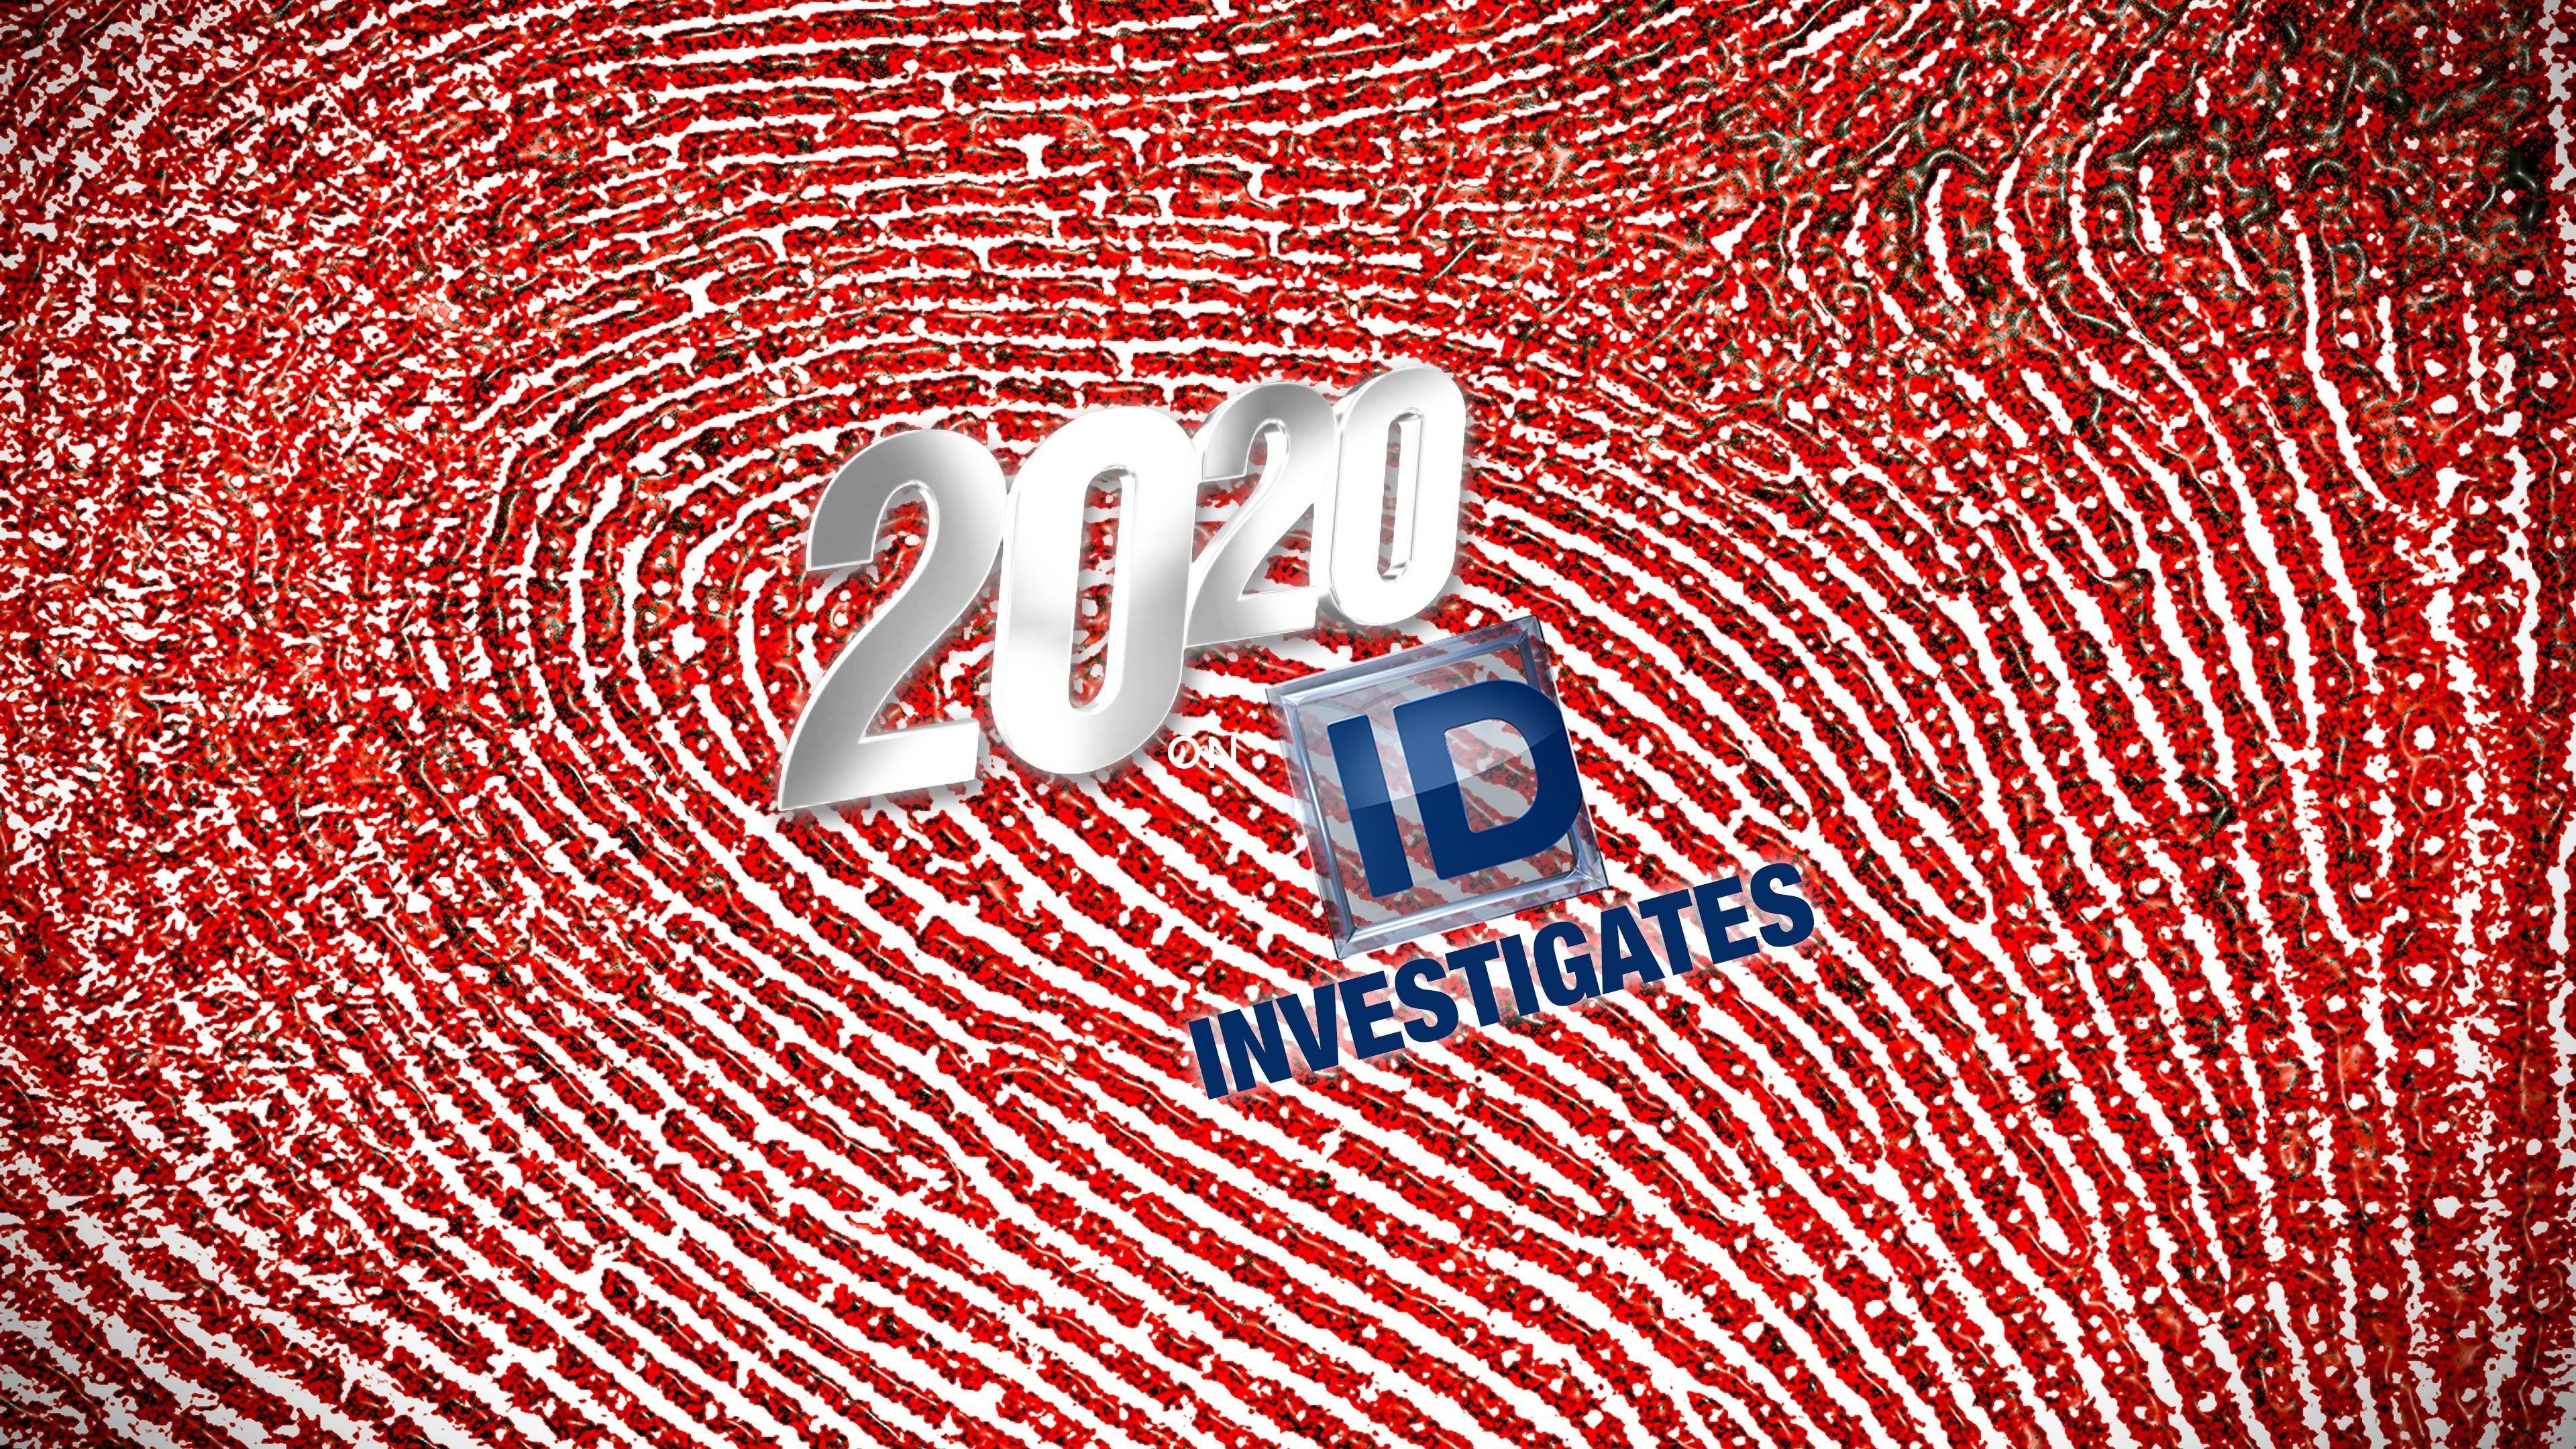 20/20 on ID Investigates